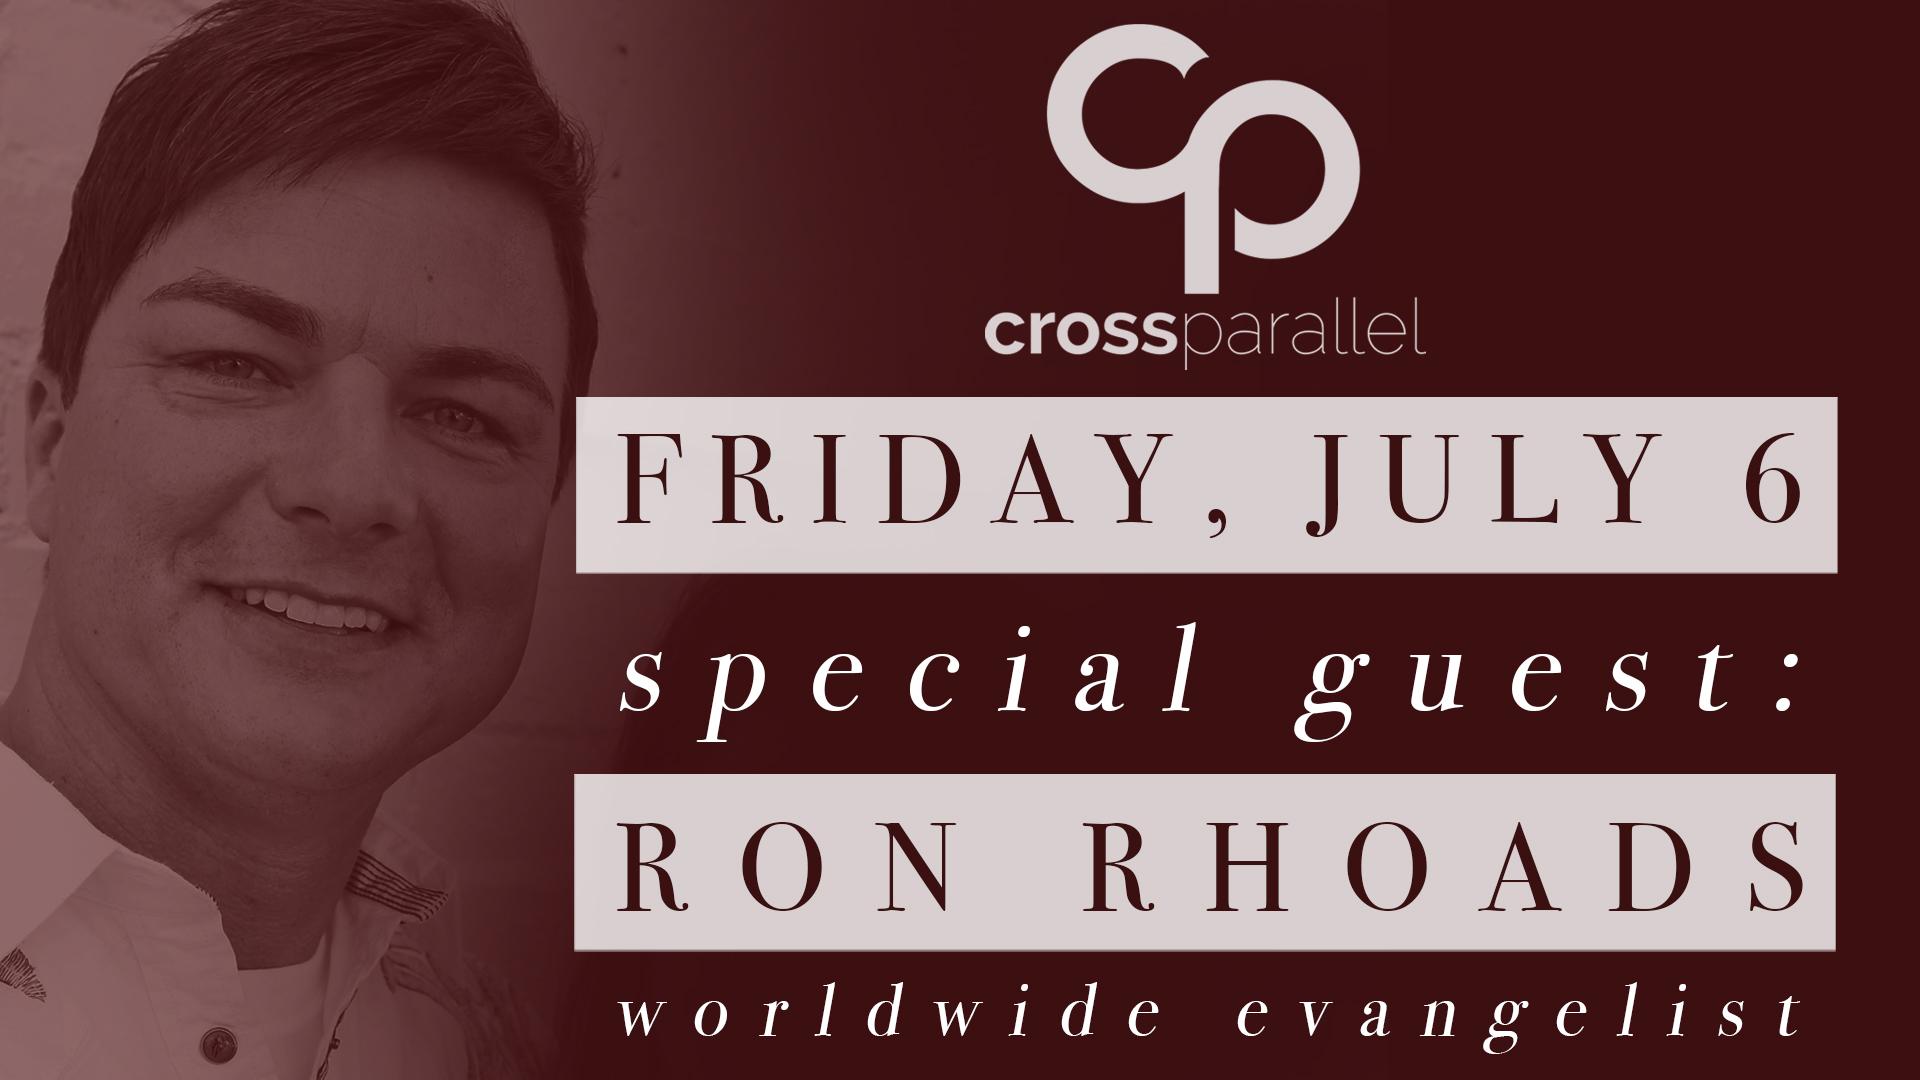 Ron Rhoads at CP.jpg